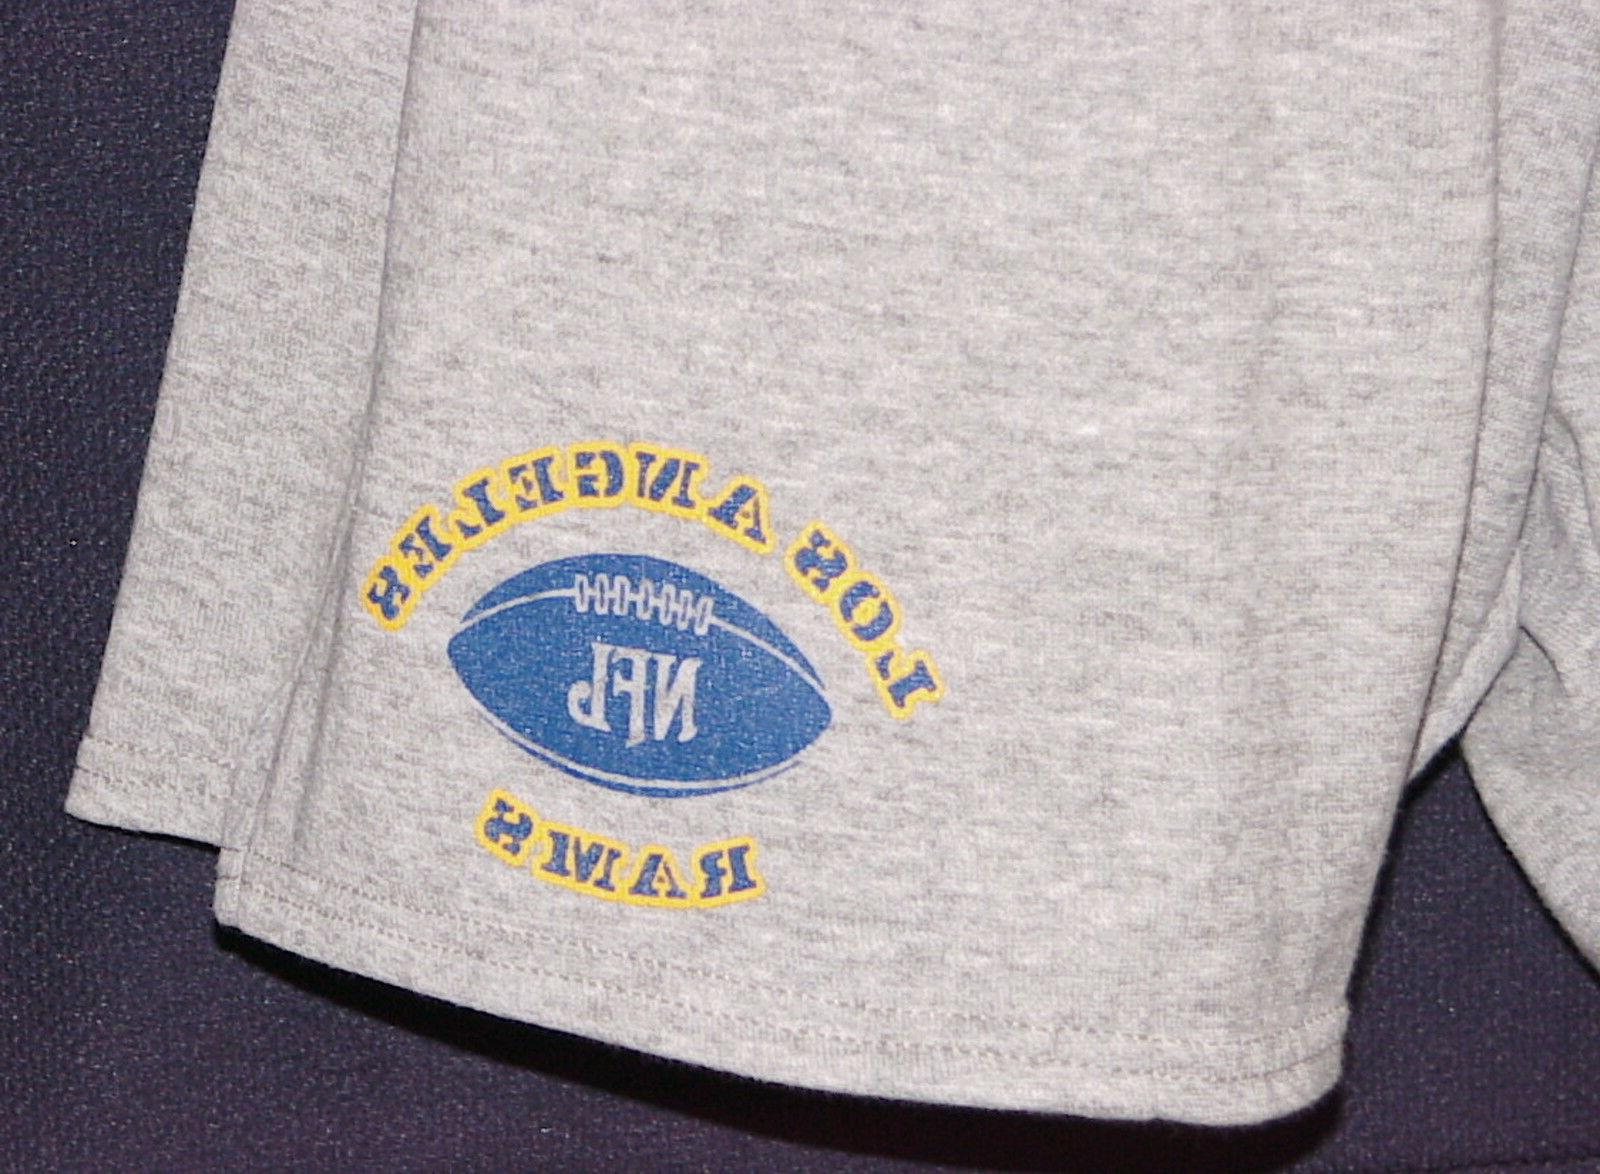 Vintage 80s/90s NFL Los SHORT Shorts Stock